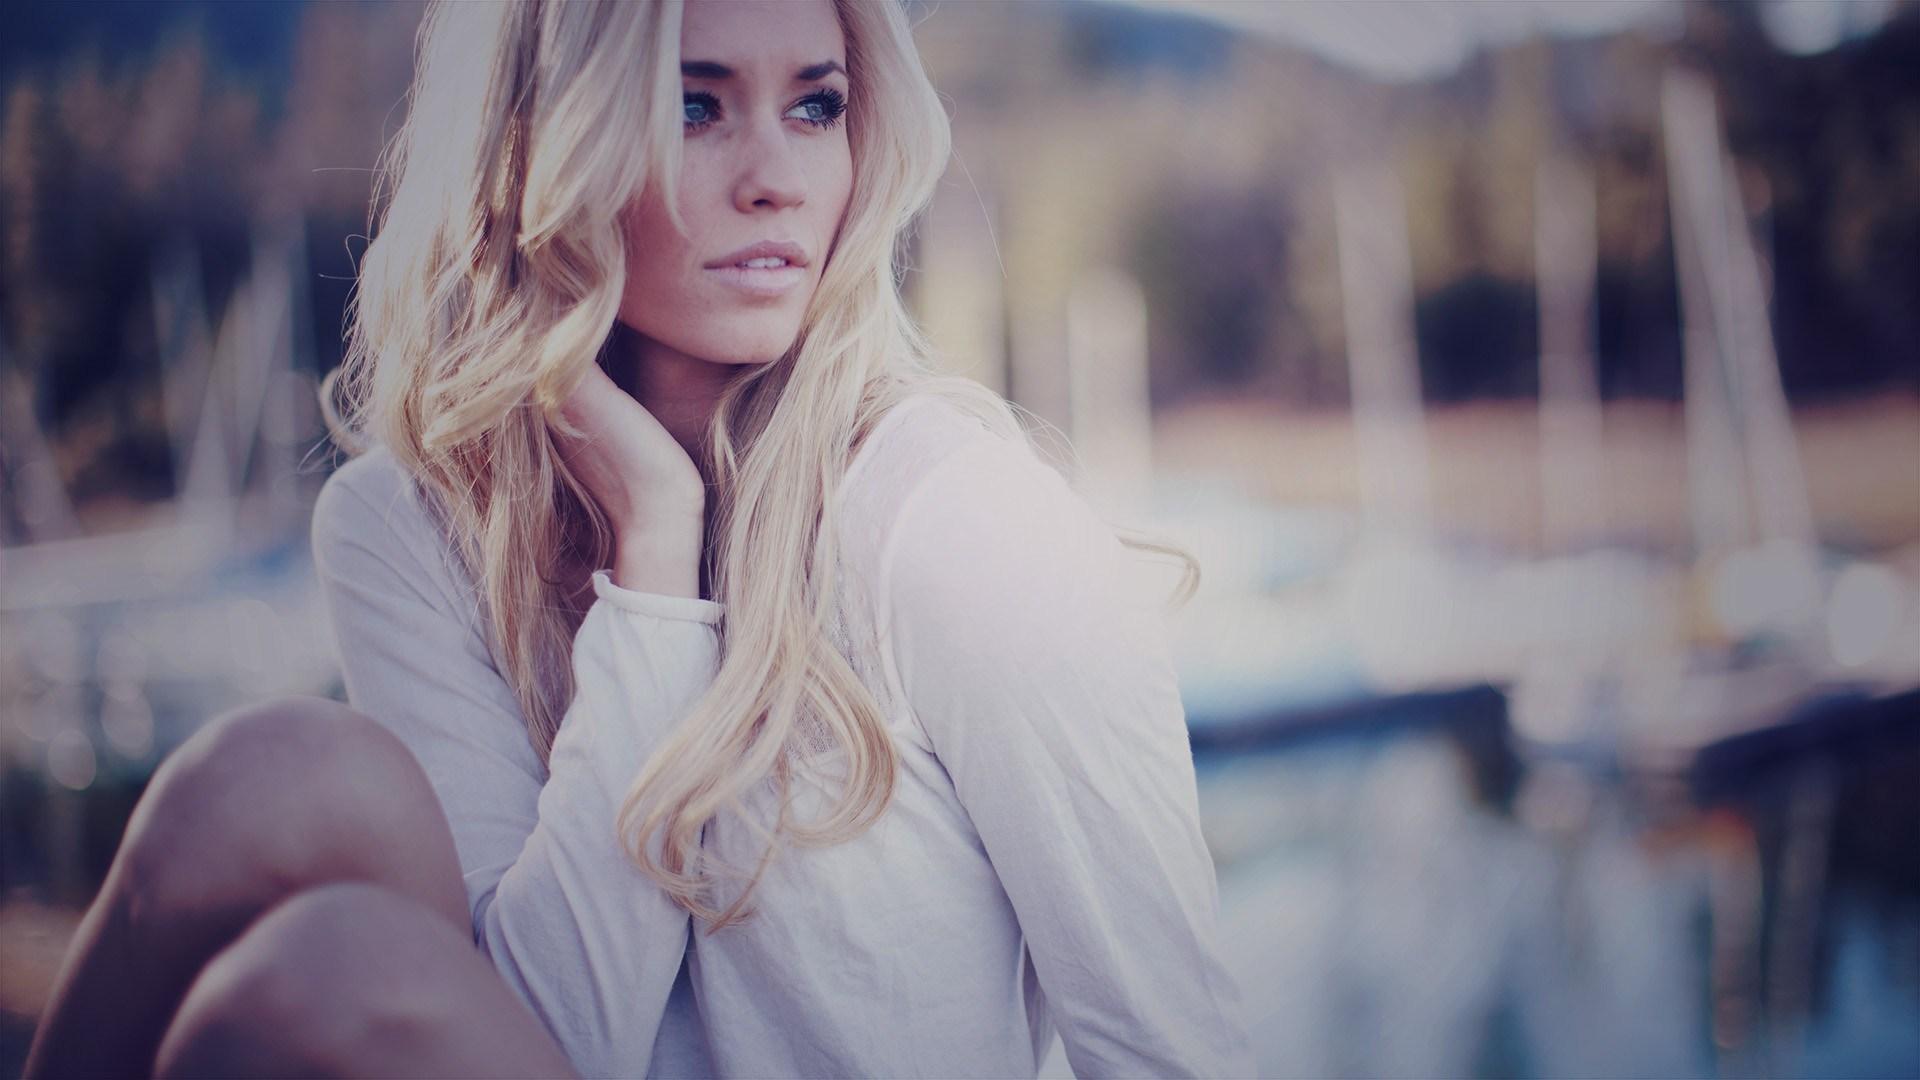 Beauty Blonde Girl Model Photo